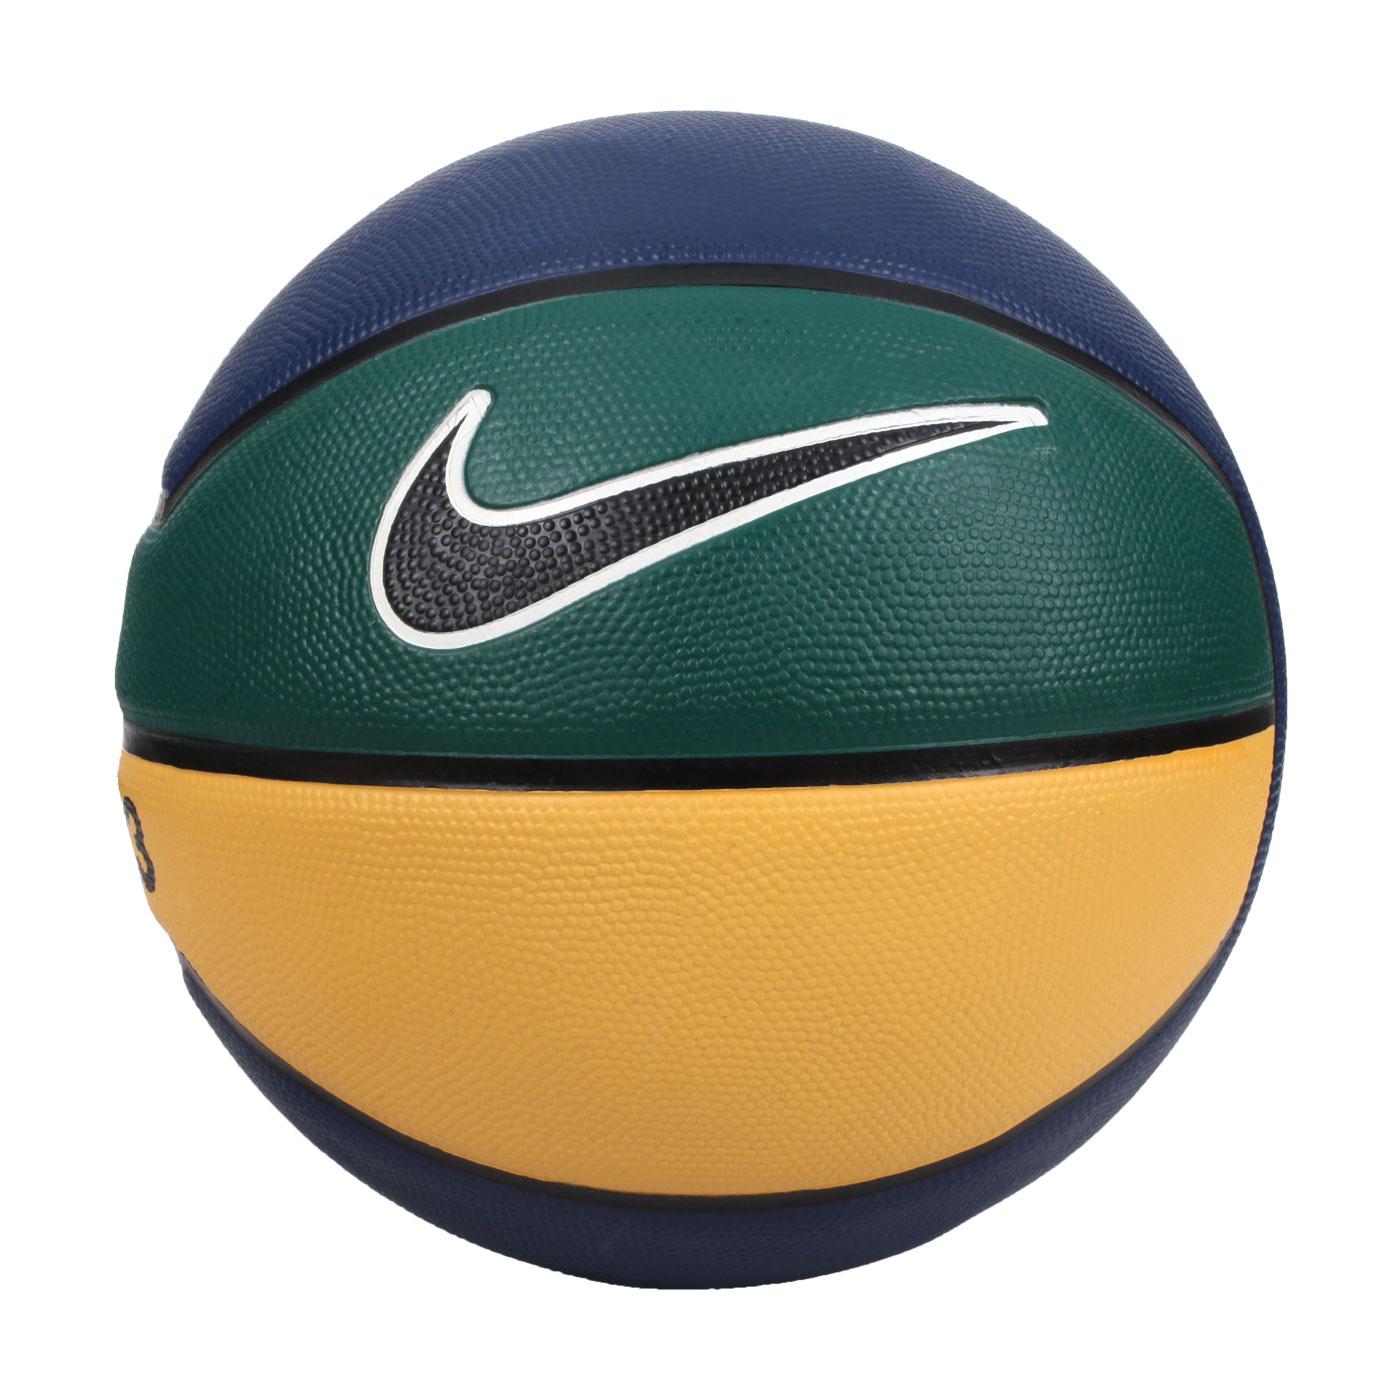 NIKE LEBRON PLAYGROUND 4P 7號籃球 N000278449007